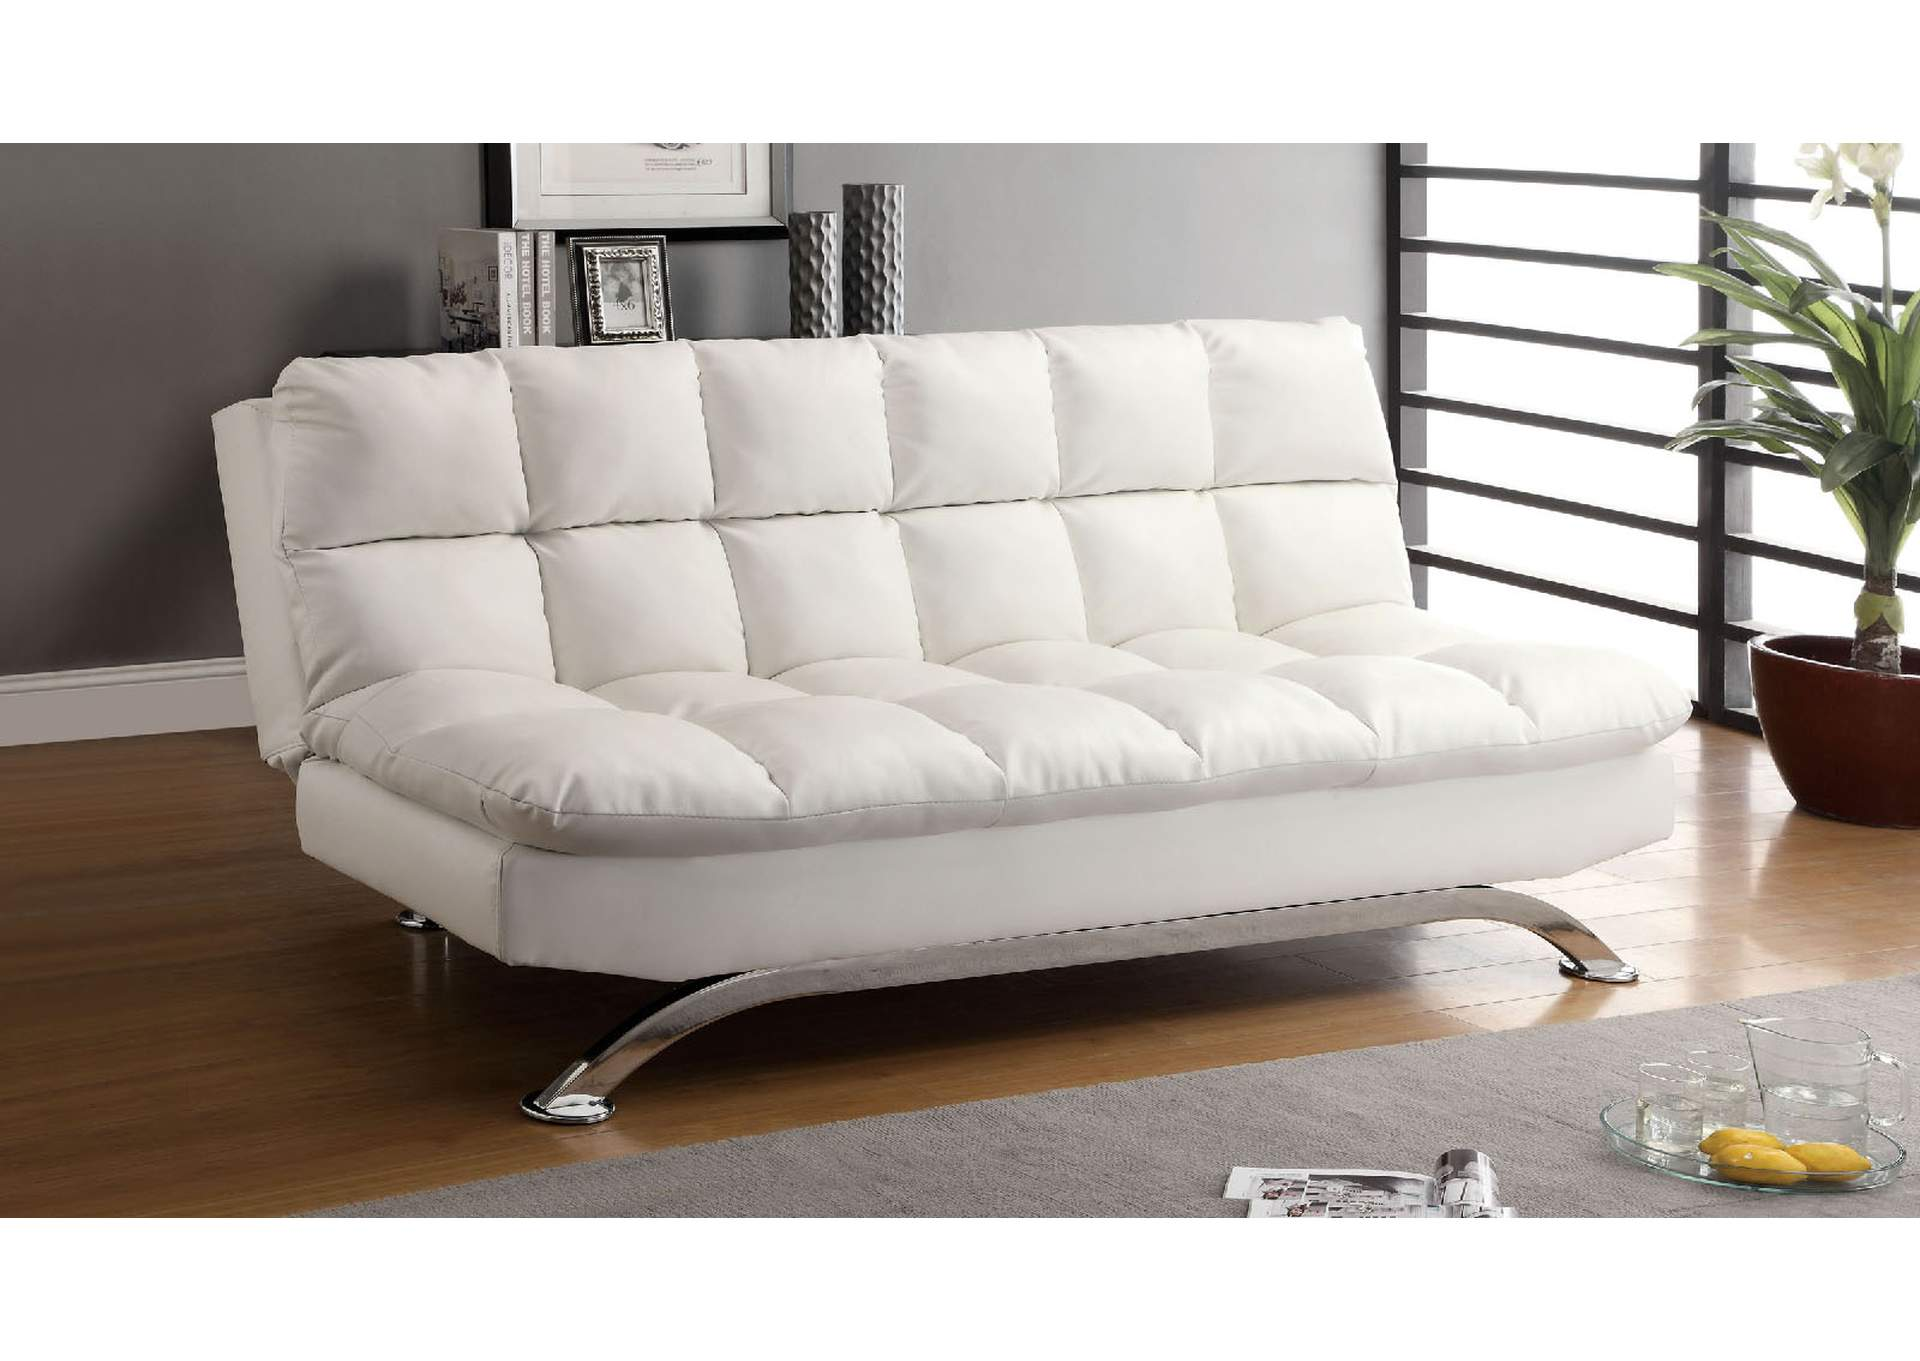 Aristo White Futon Sofa,Furniture Of America